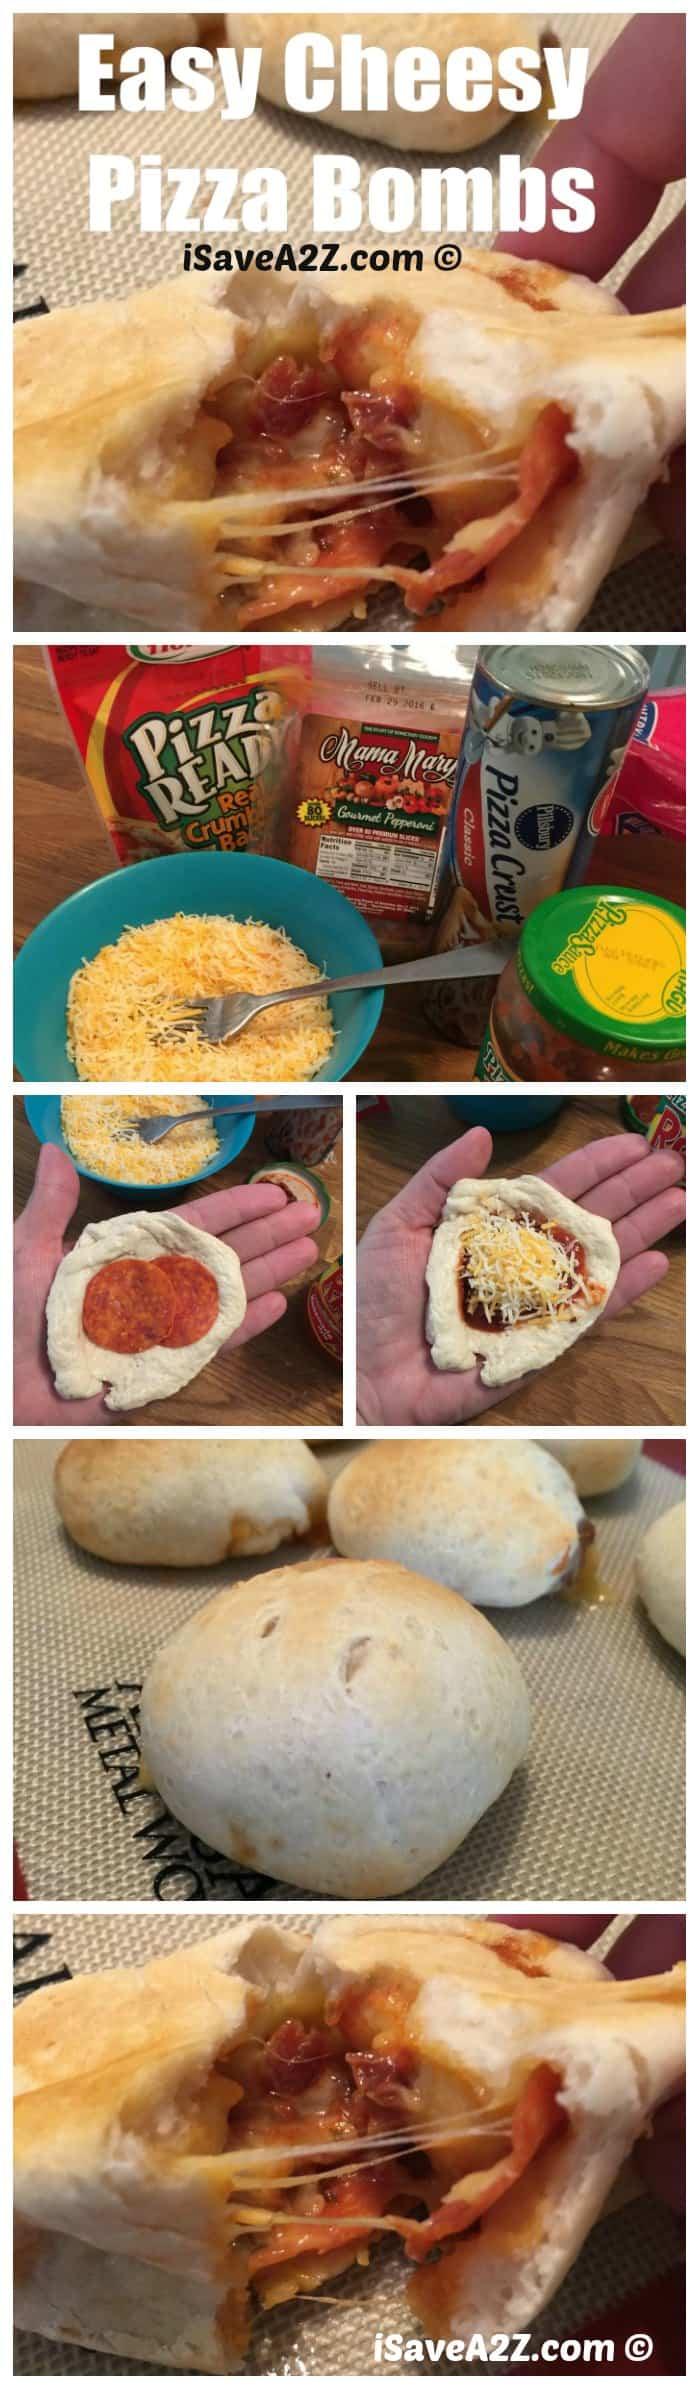 Easy Cheesy Pizza Bread Recipe